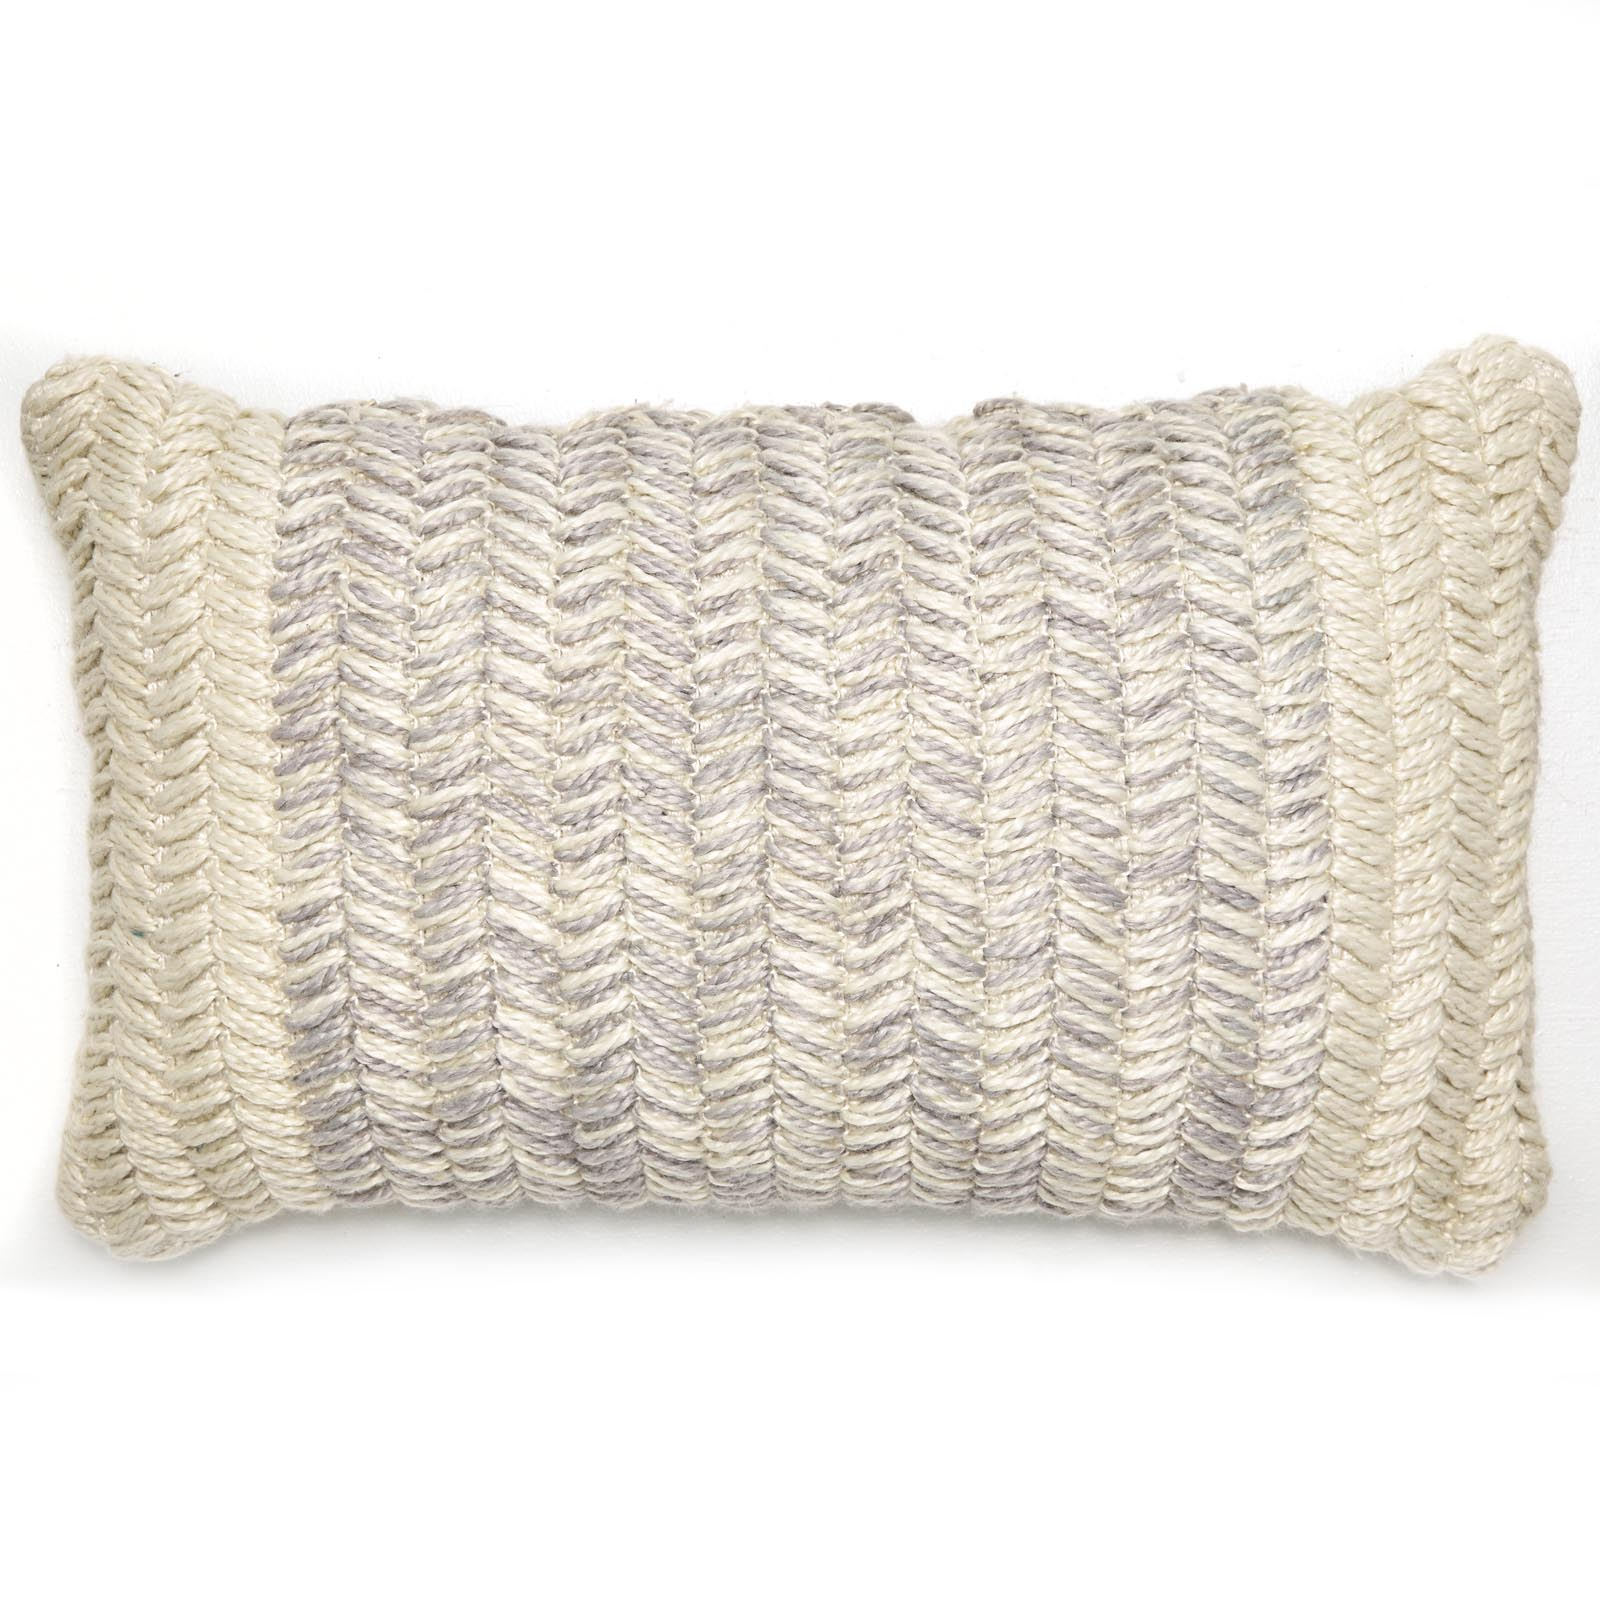 MoDRN Braided Texture Lumbar Outdoor Throw Pillow - Grey 14 in. x 24 in.